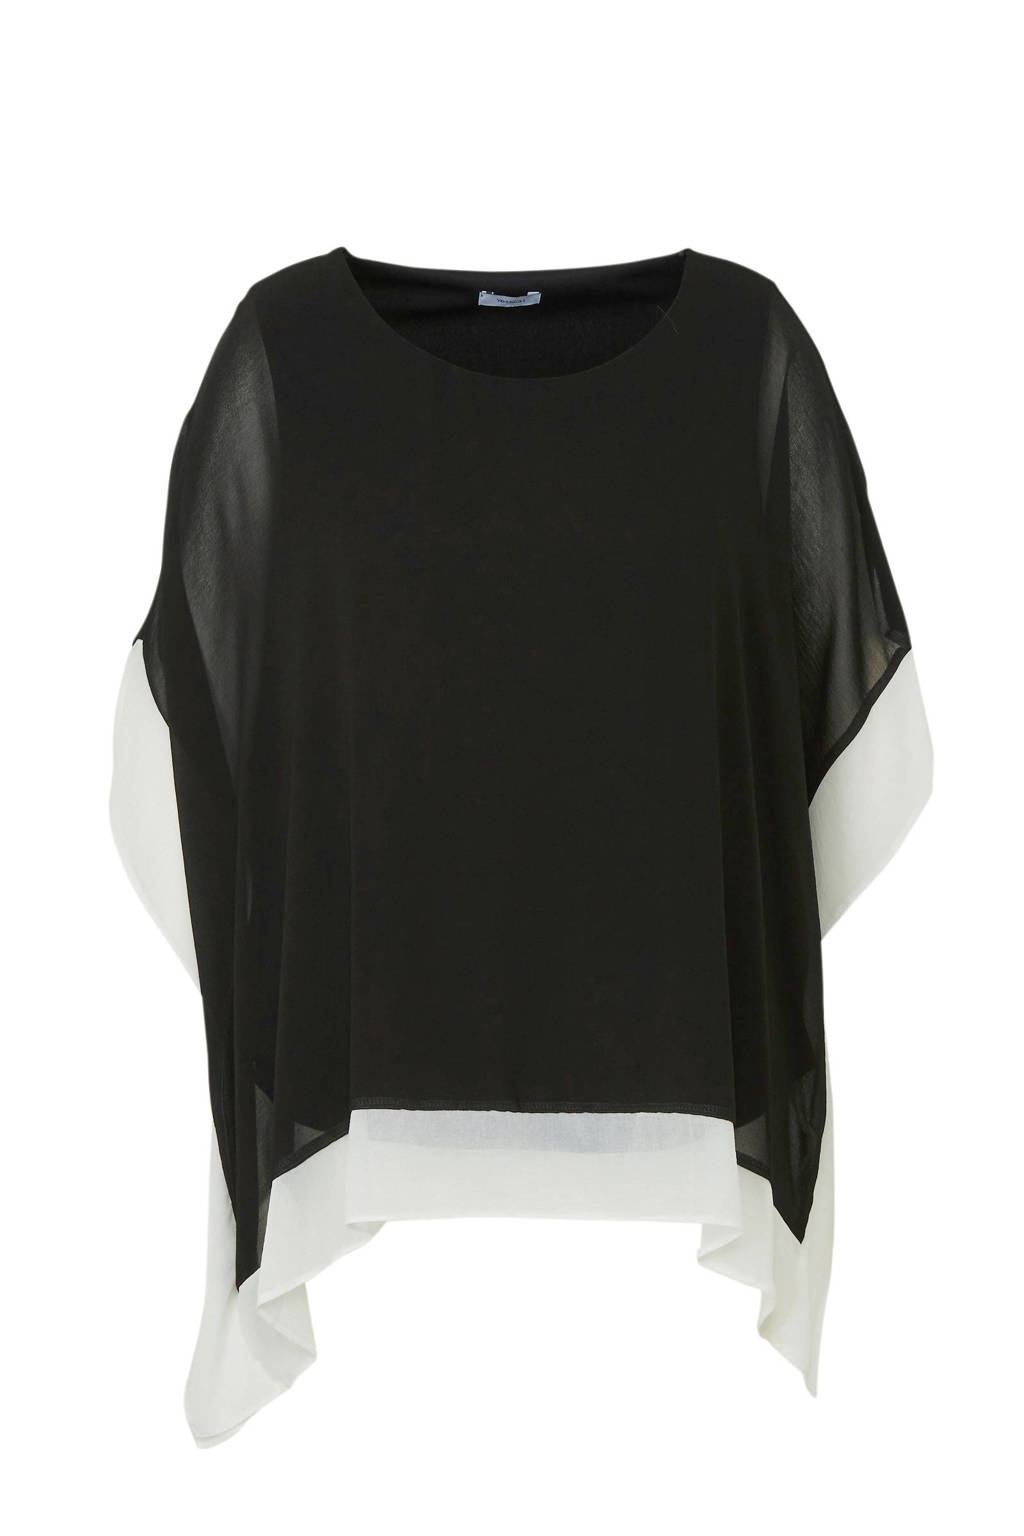 C&A XL Yessica top zwart/wit, Zwart/wit